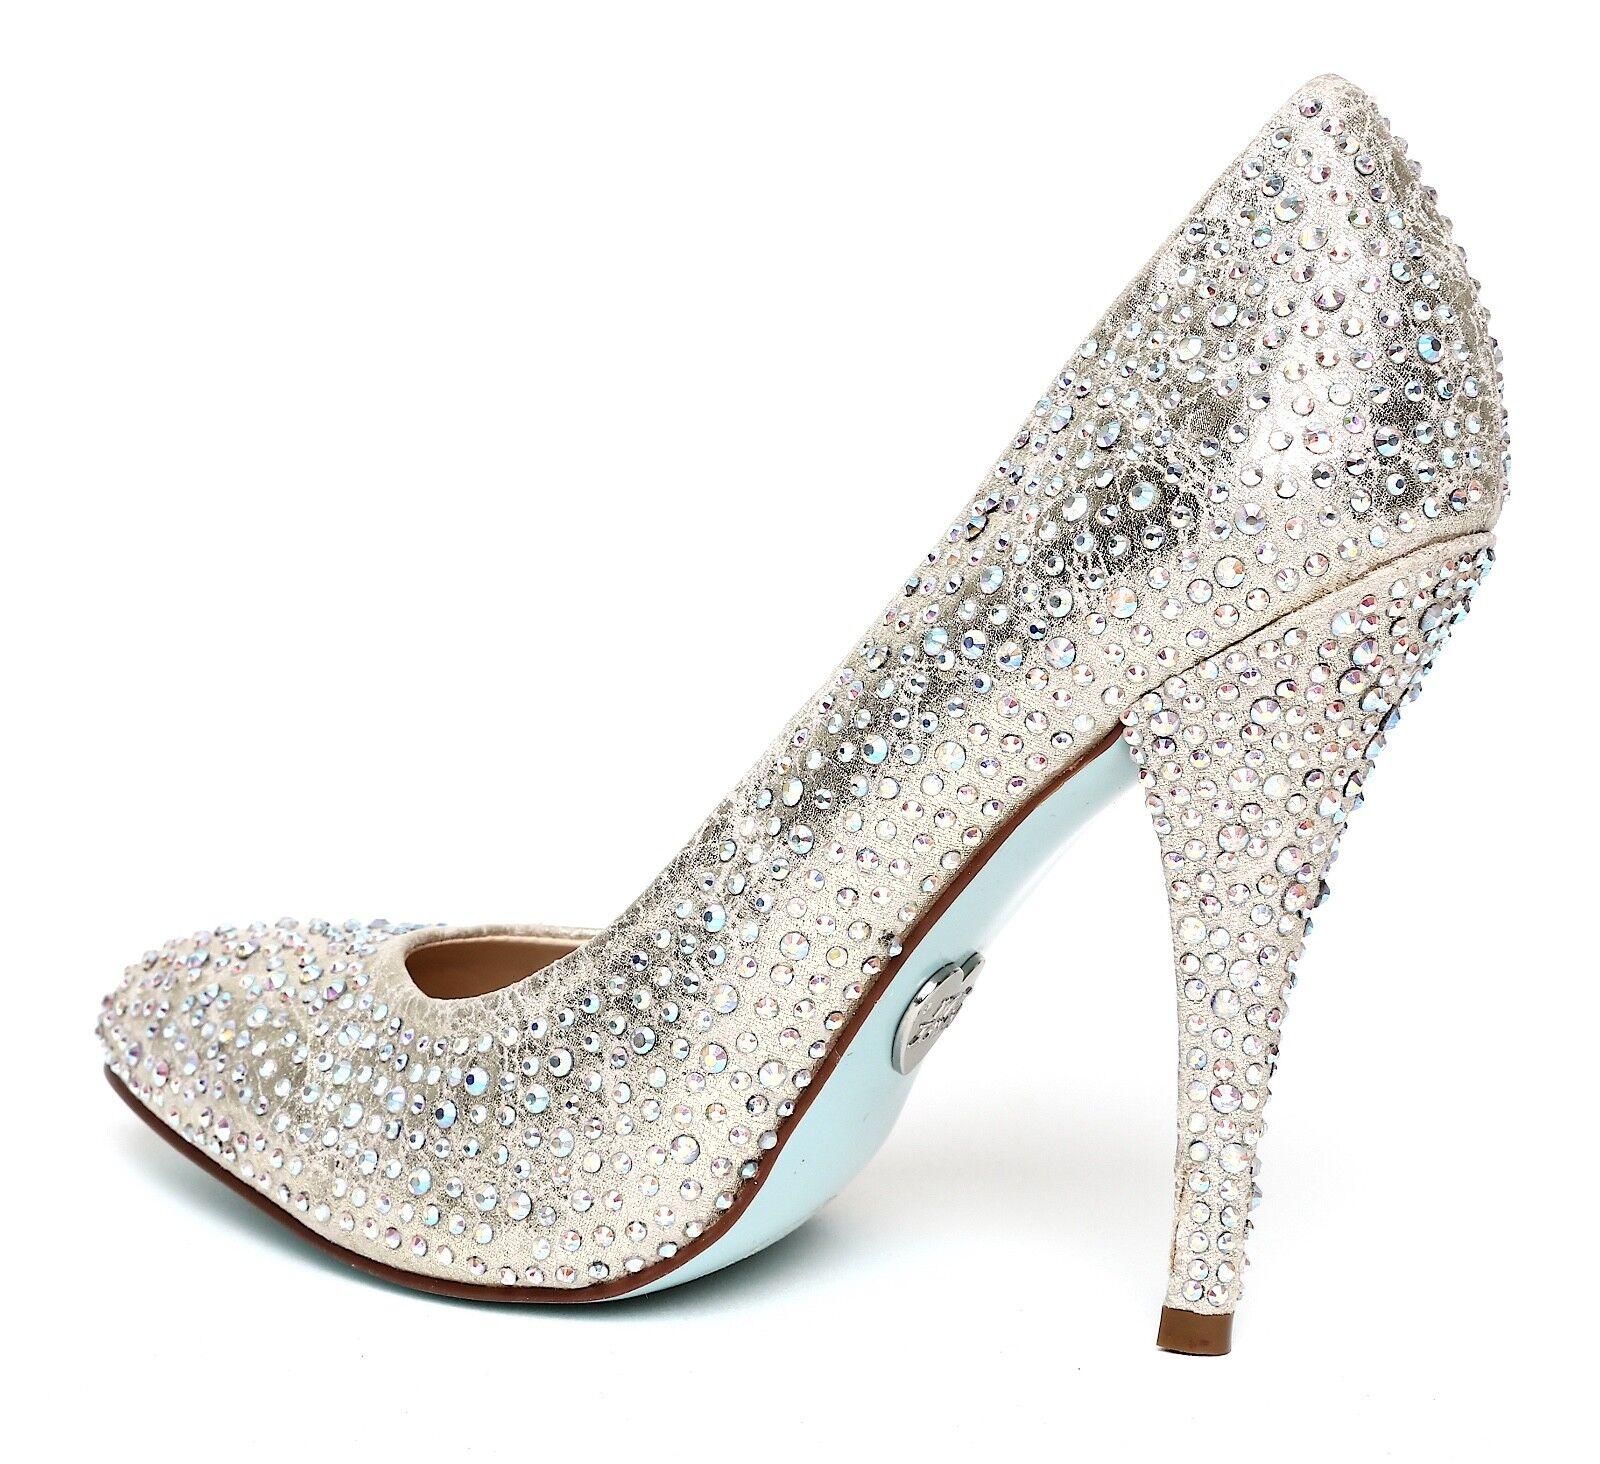 Betsey Johnson Damens Shine Pointy Toe Pump Metallic Damens Johnson Sz 8.5 1447 0705ce